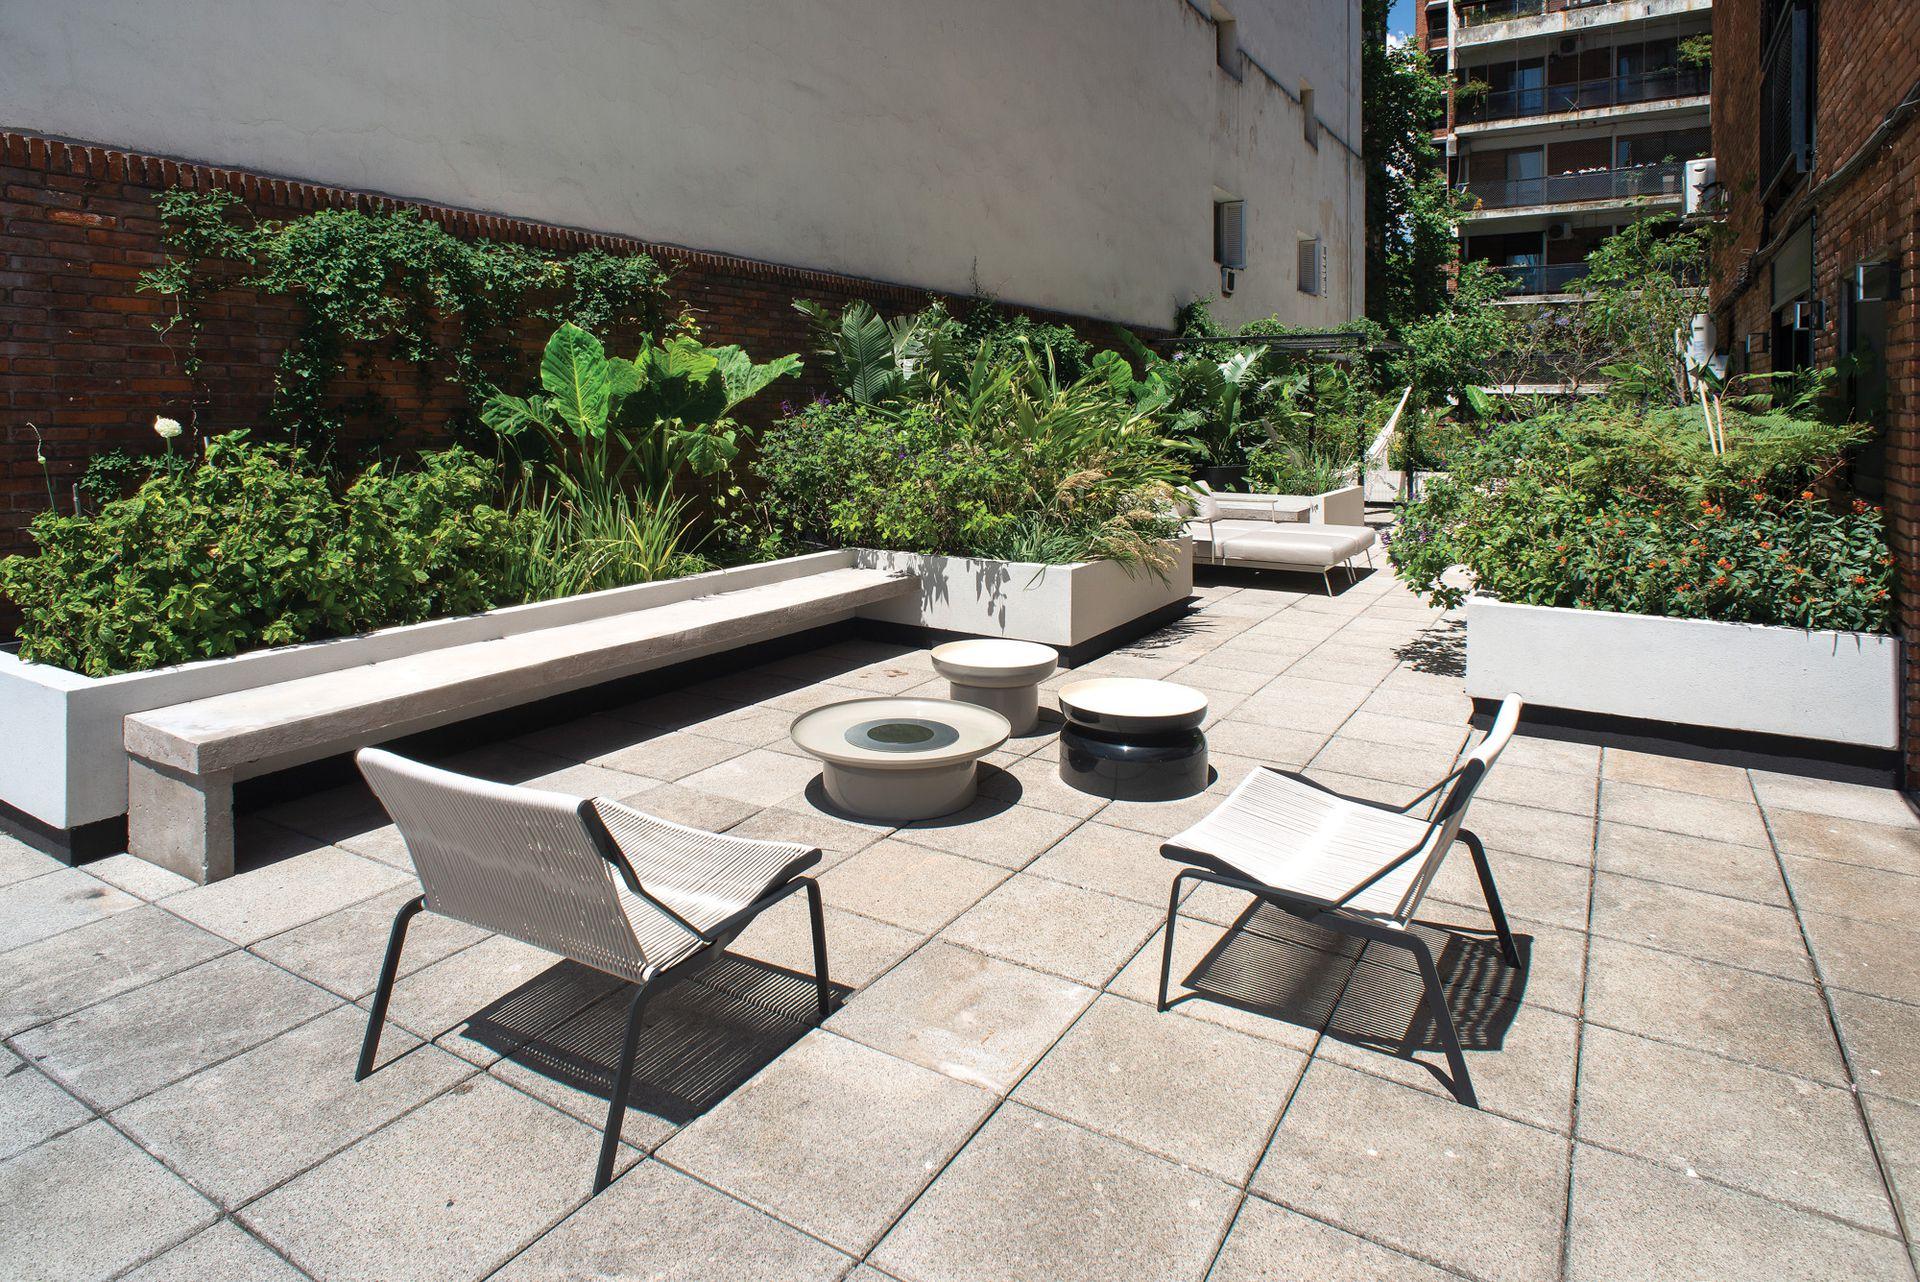 Las mesas circulares de distintos diámetros son del modelo Pluvial, de aluminio, aptas para exterior.